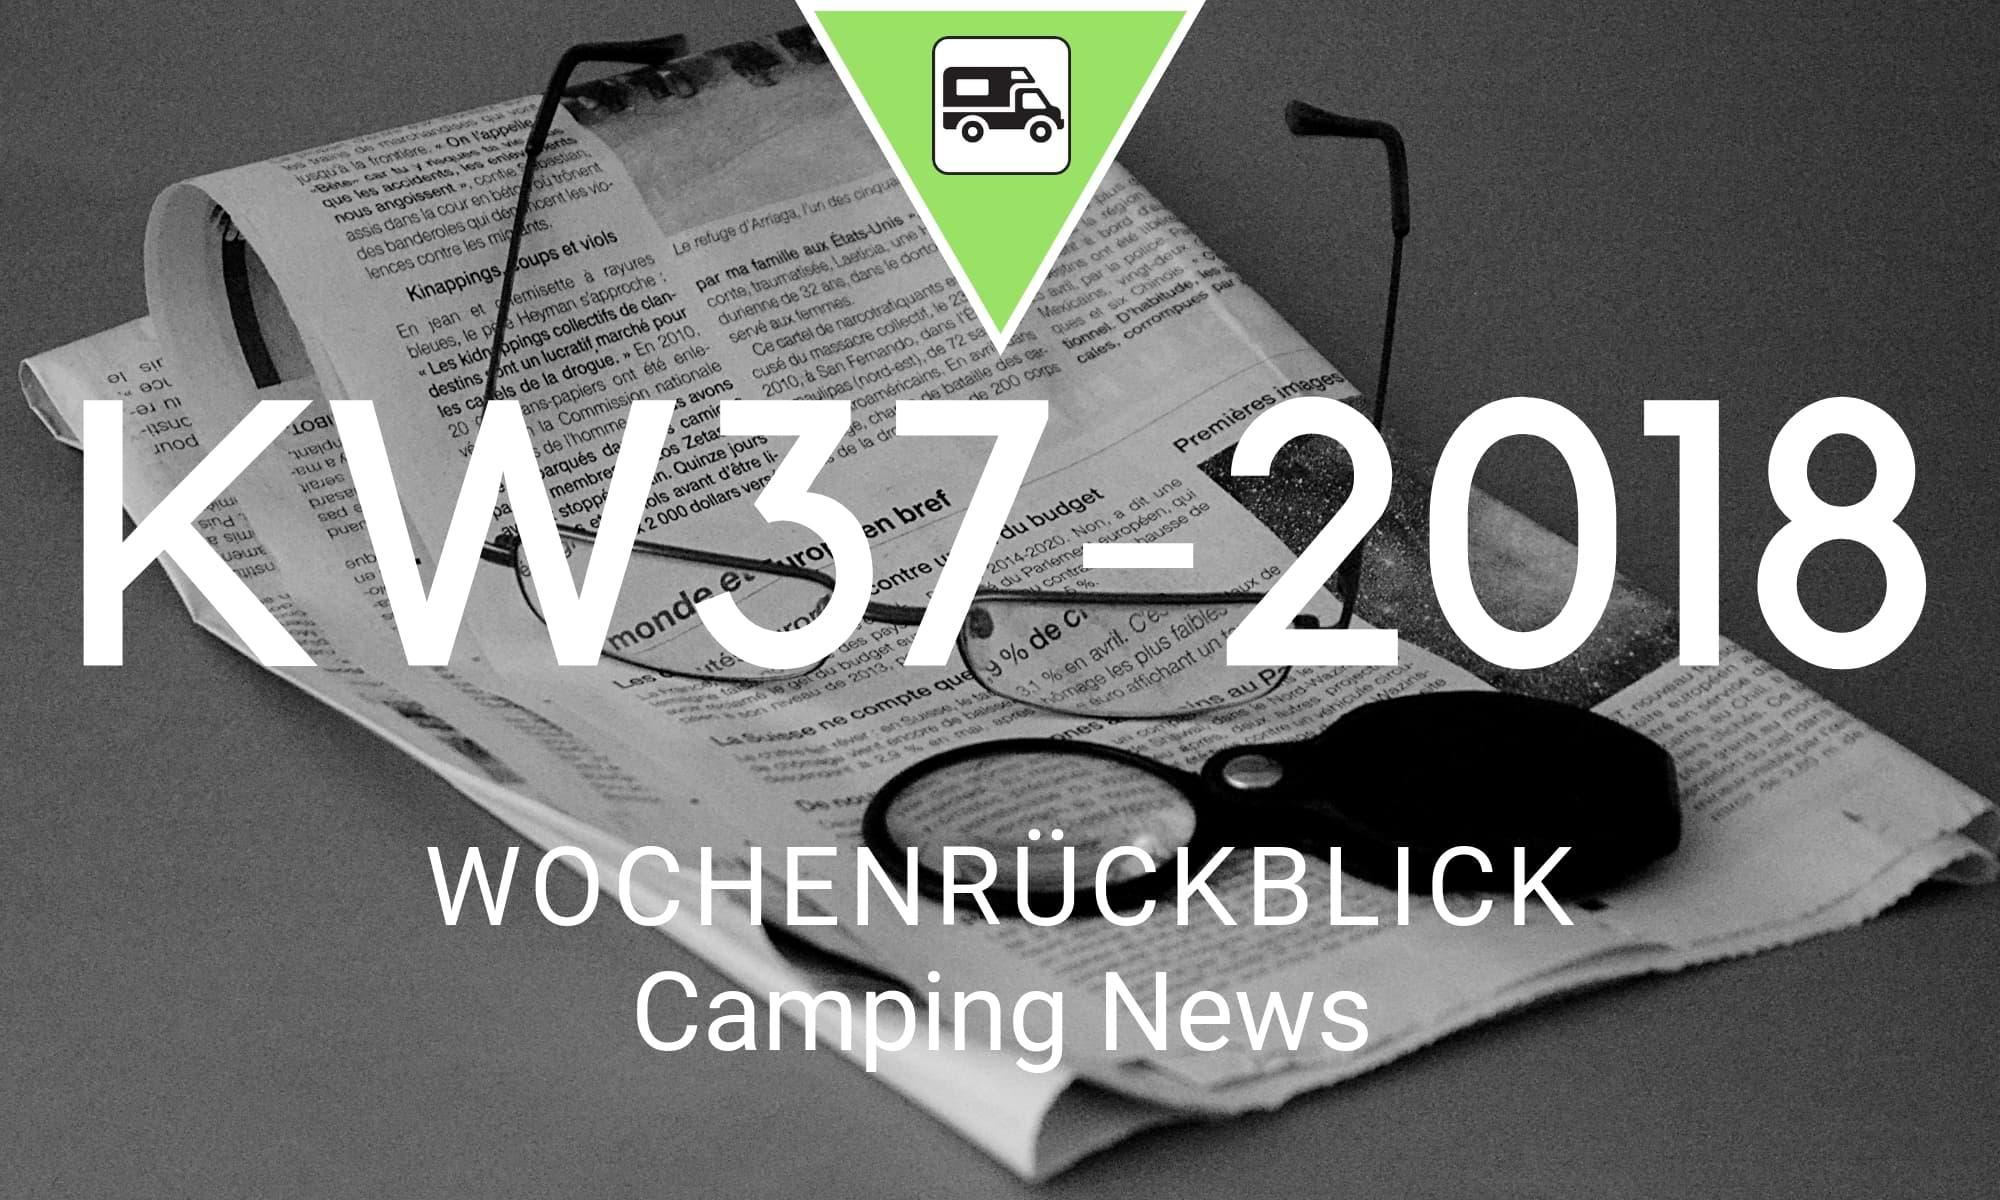 Wochenrückblick Camping News KW37-2018